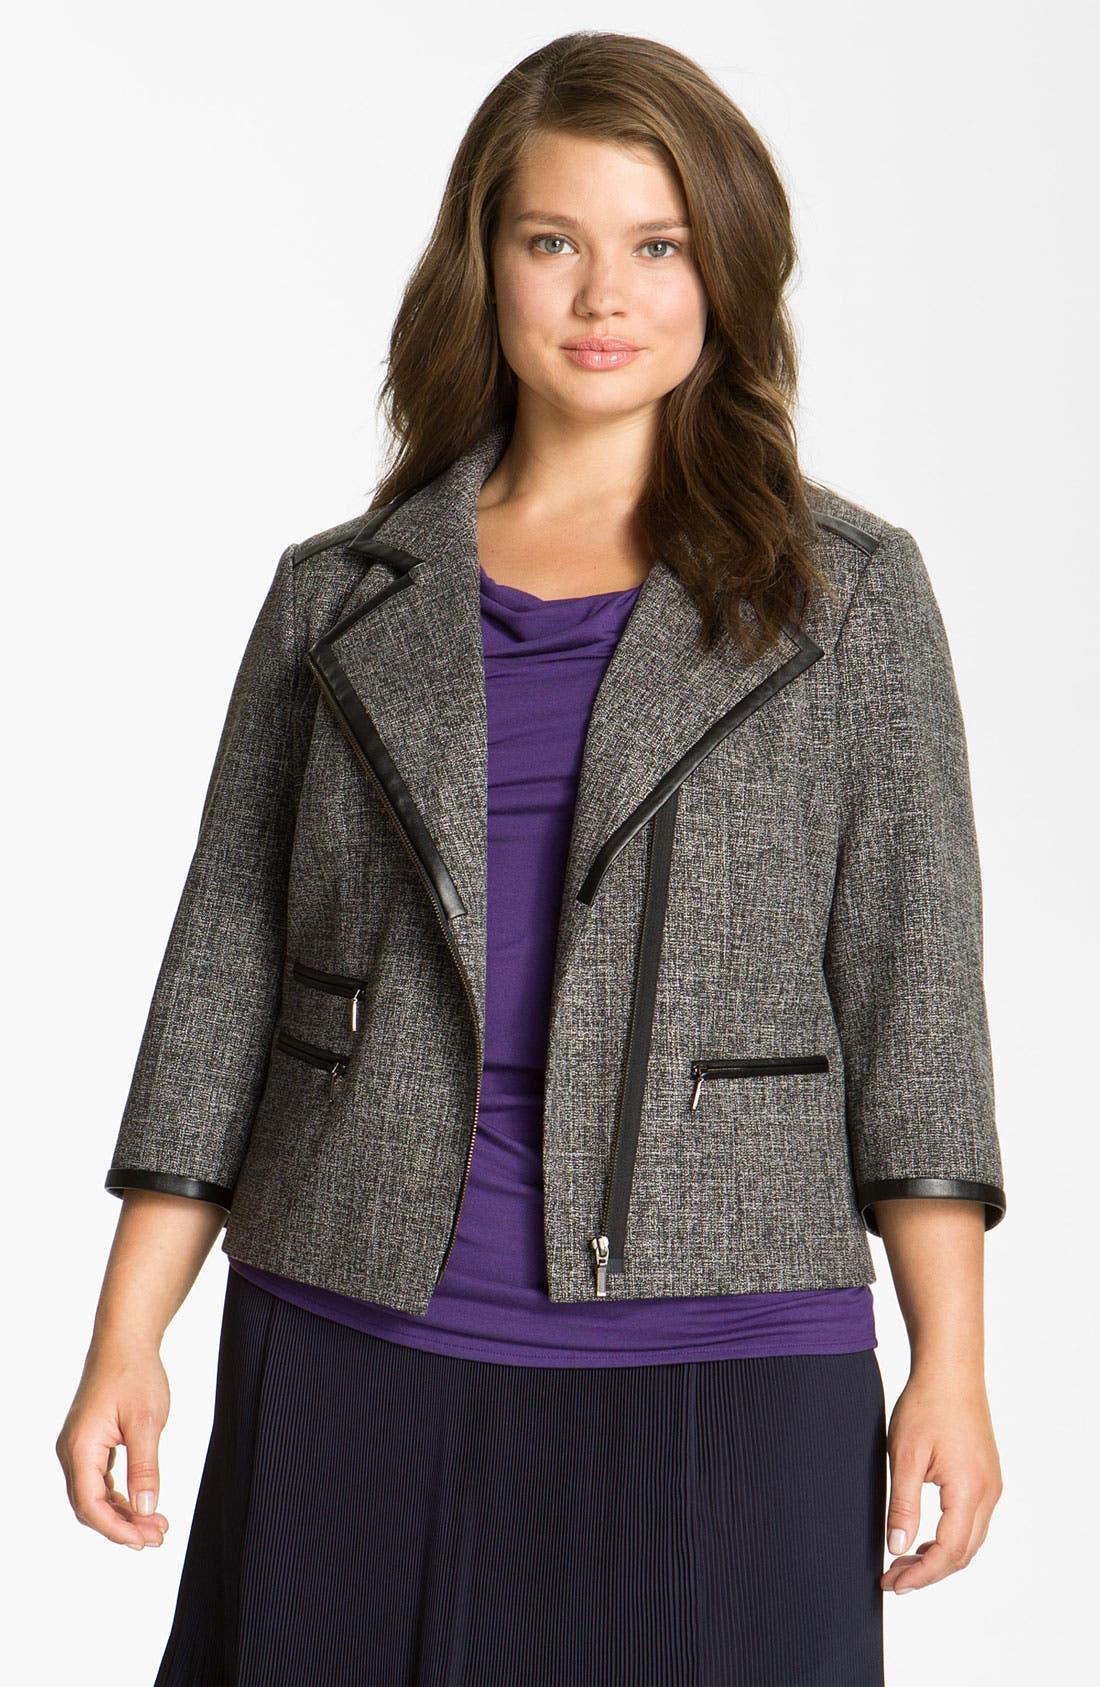 Alternate Image 1 Selected - Sejour Faux Leather Trim Jacket (Plus)